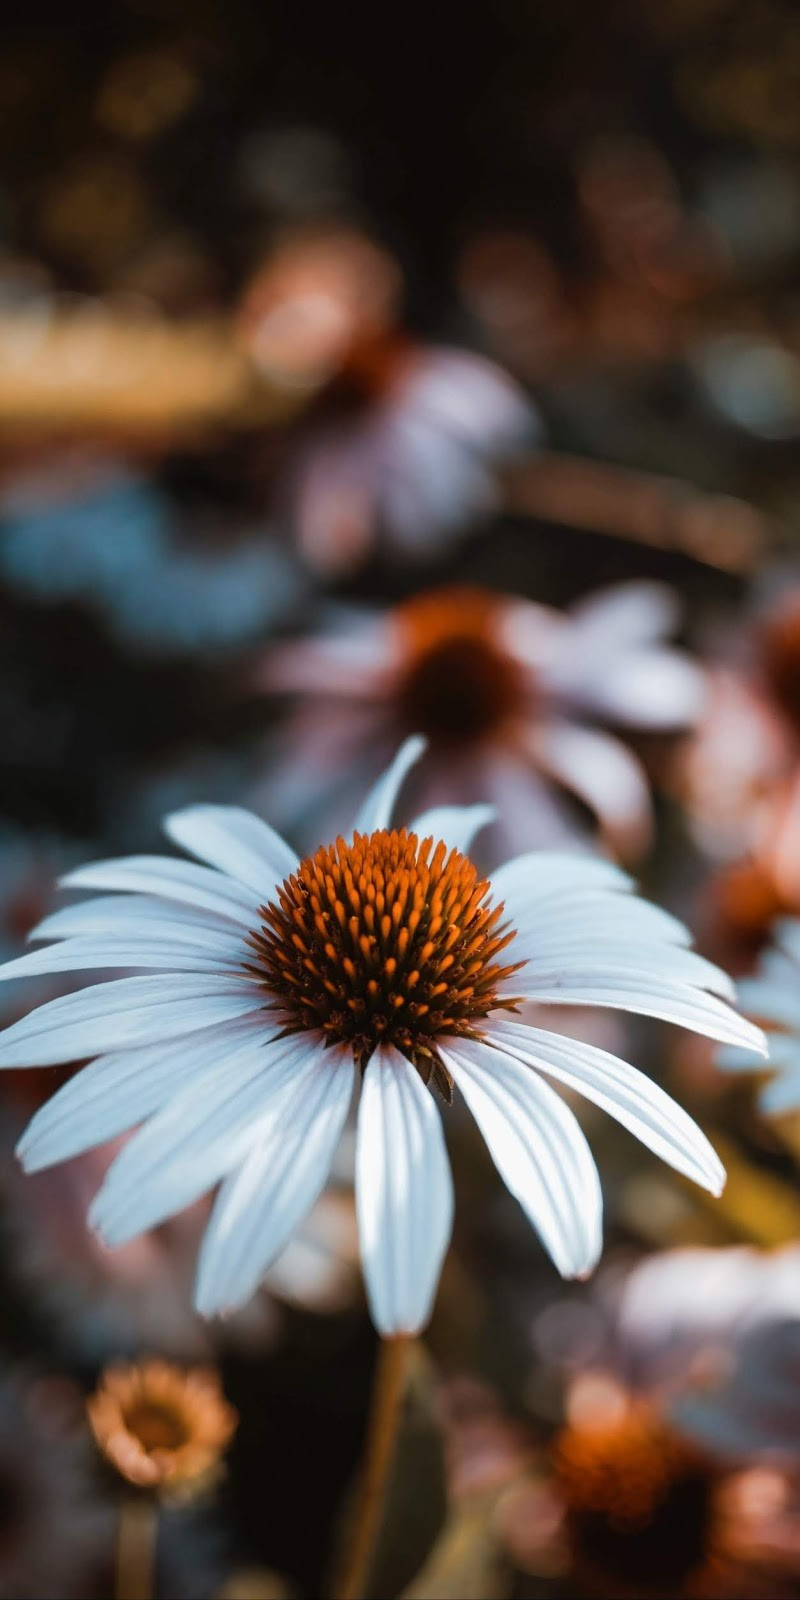 iPhone XS daisy